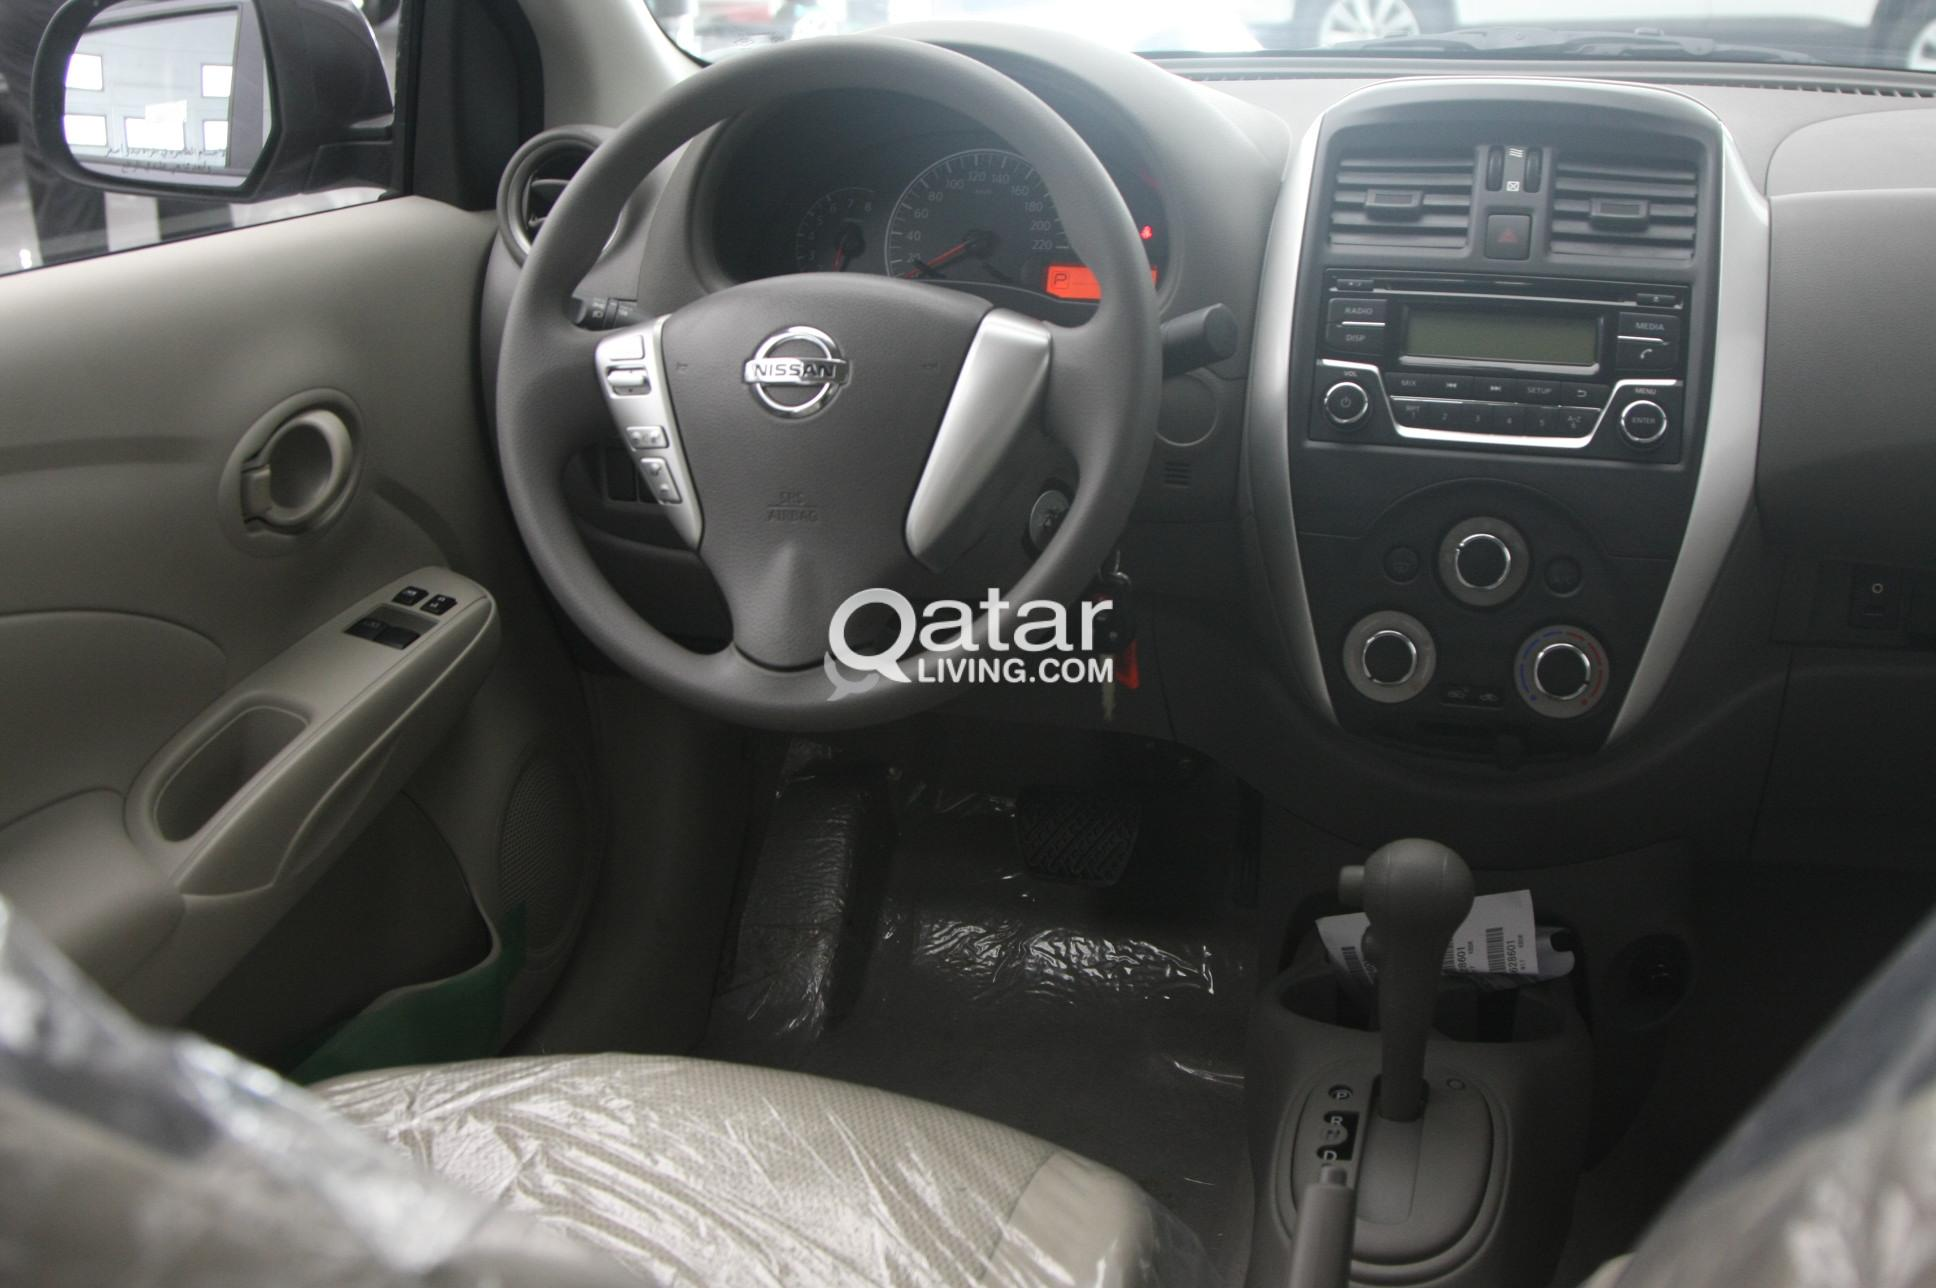 brand new toyota camry engine interior agya trd 2018 nissan sunny   qatar living